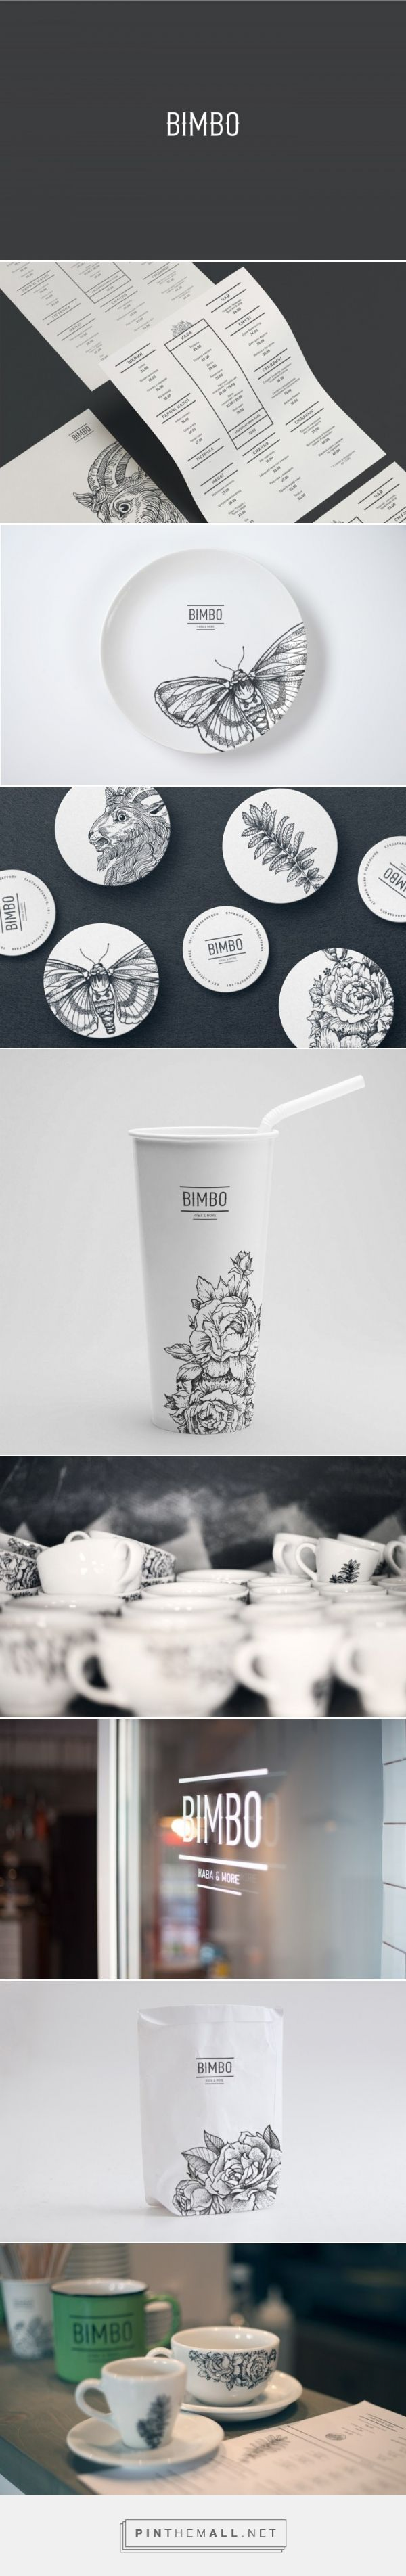 Bimbo Coffee Bar Branding by Grits + Grids   Fivestar Branding – Design and Branding Agency & Inspiration Gallery